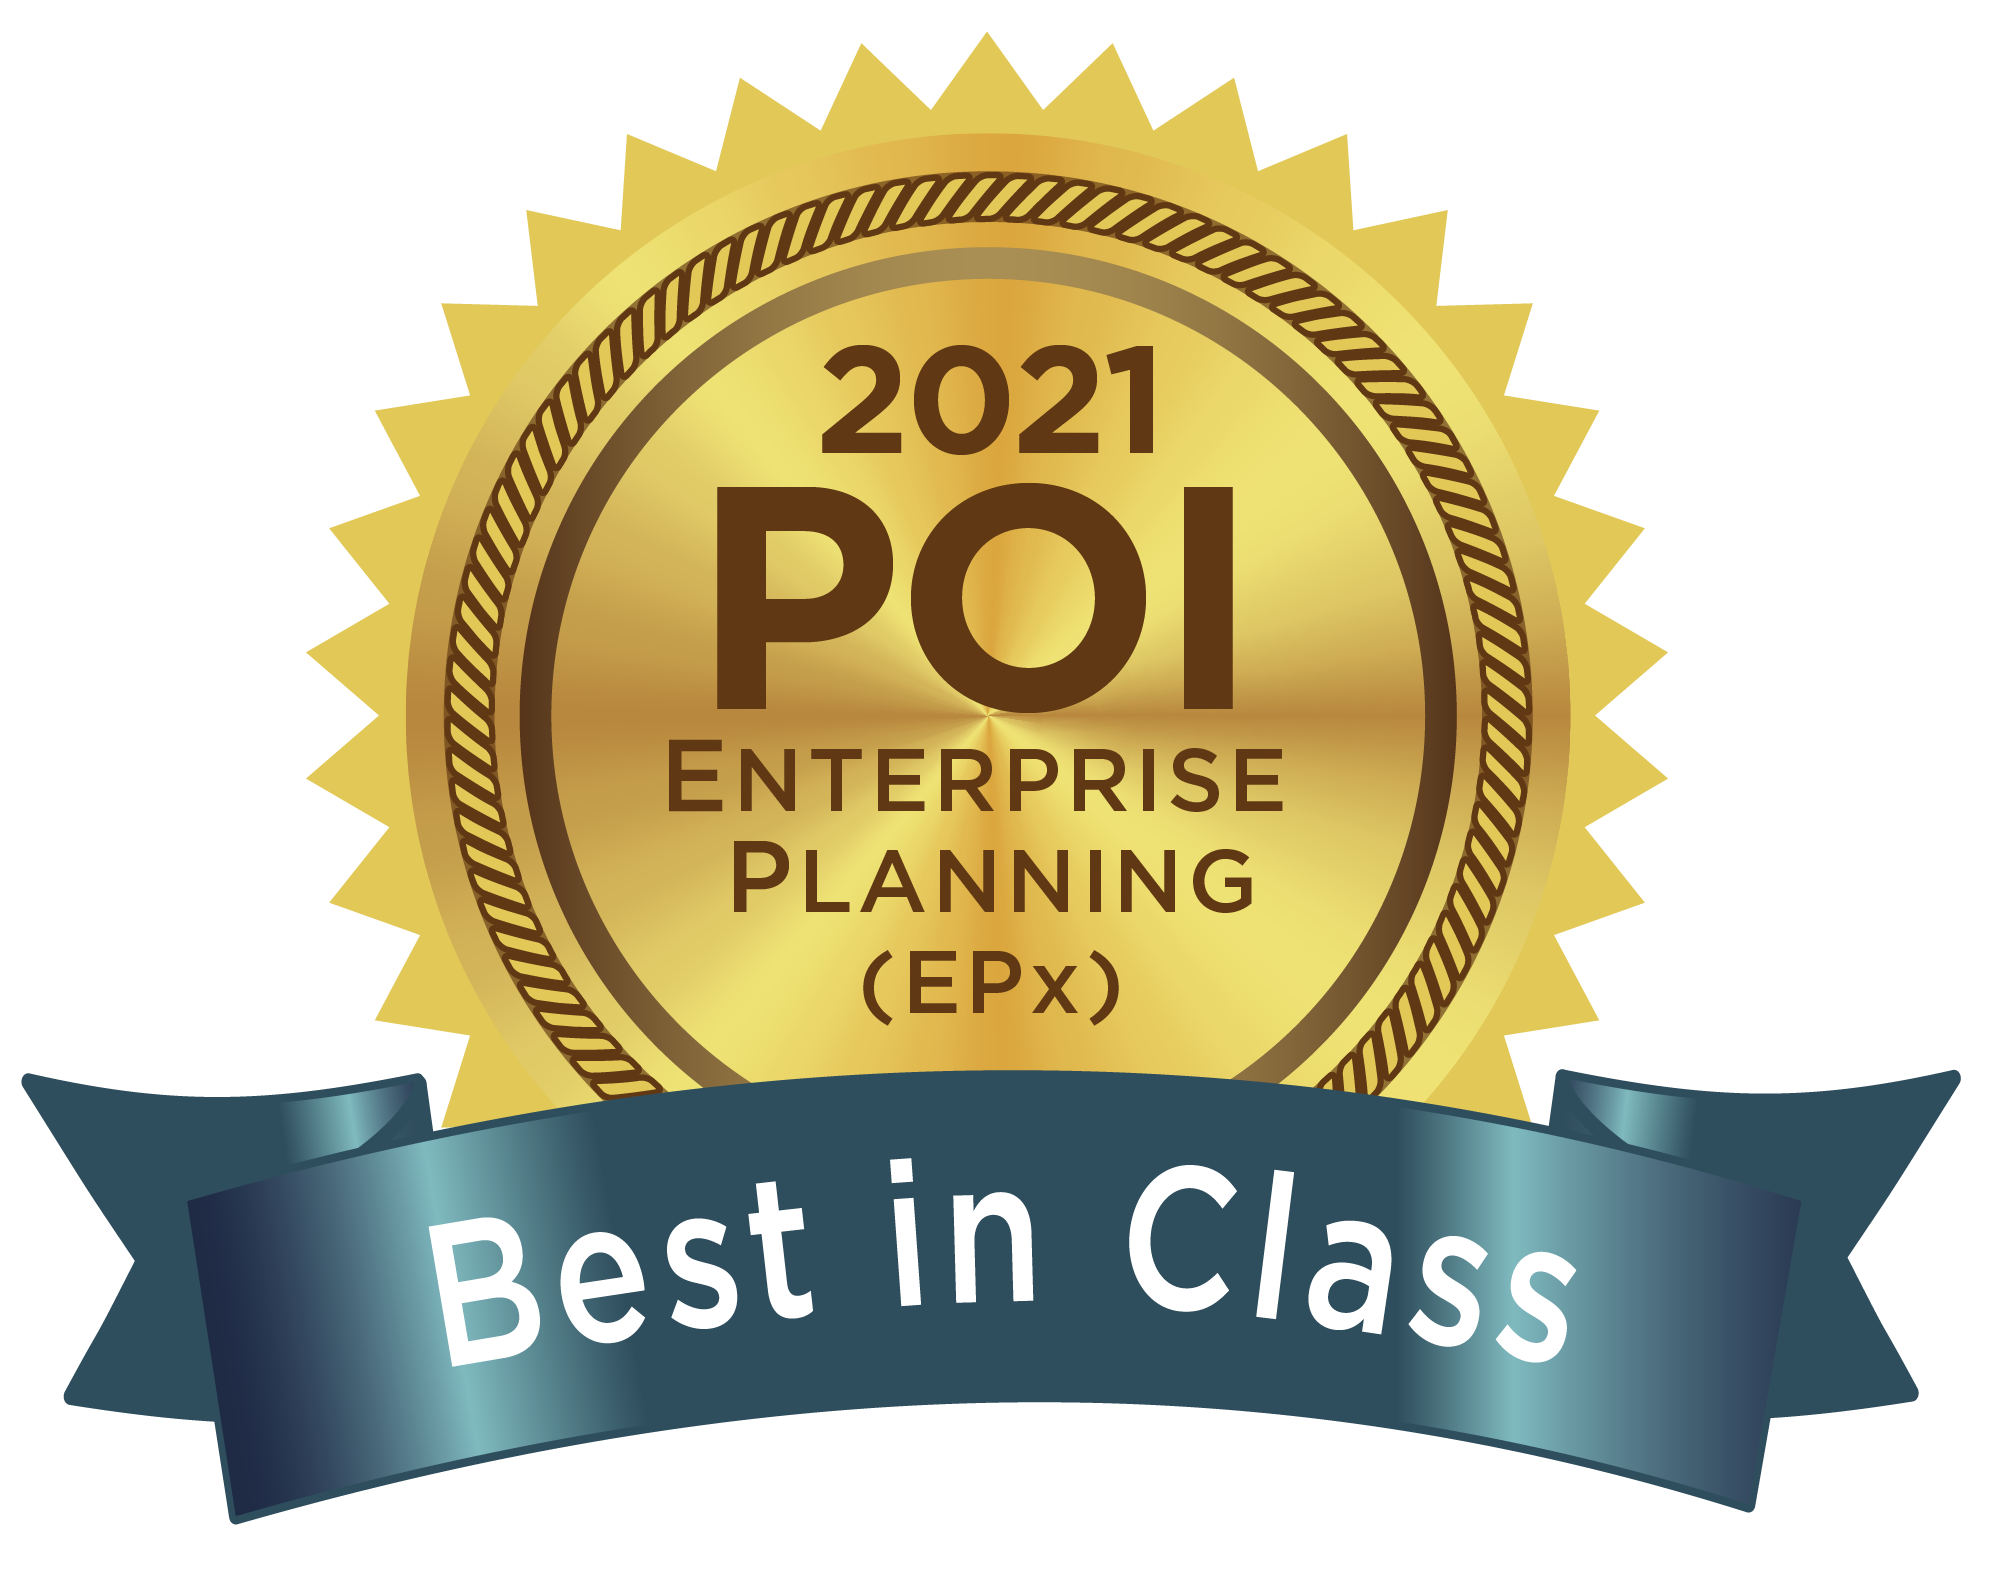 POI-2021-Best-In-Enterprise-Planning-Award-FINAL